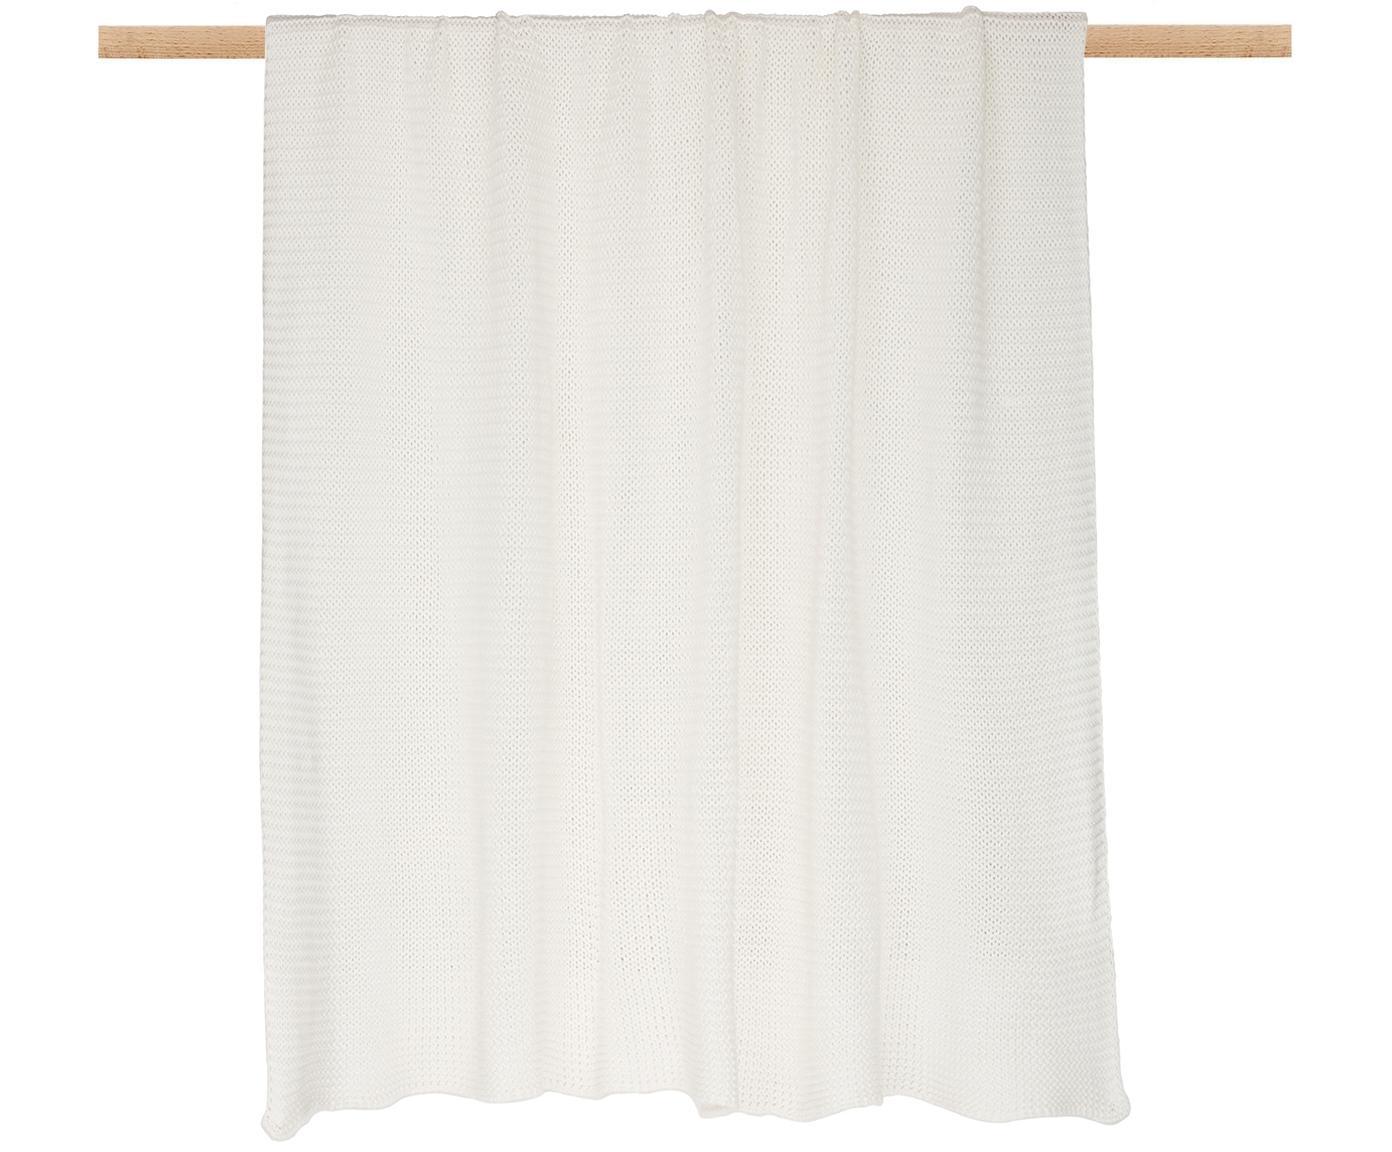 Strick-Plaid Adalyn, 100% Baumwolle, Naturweiß, 150 x 200 cm